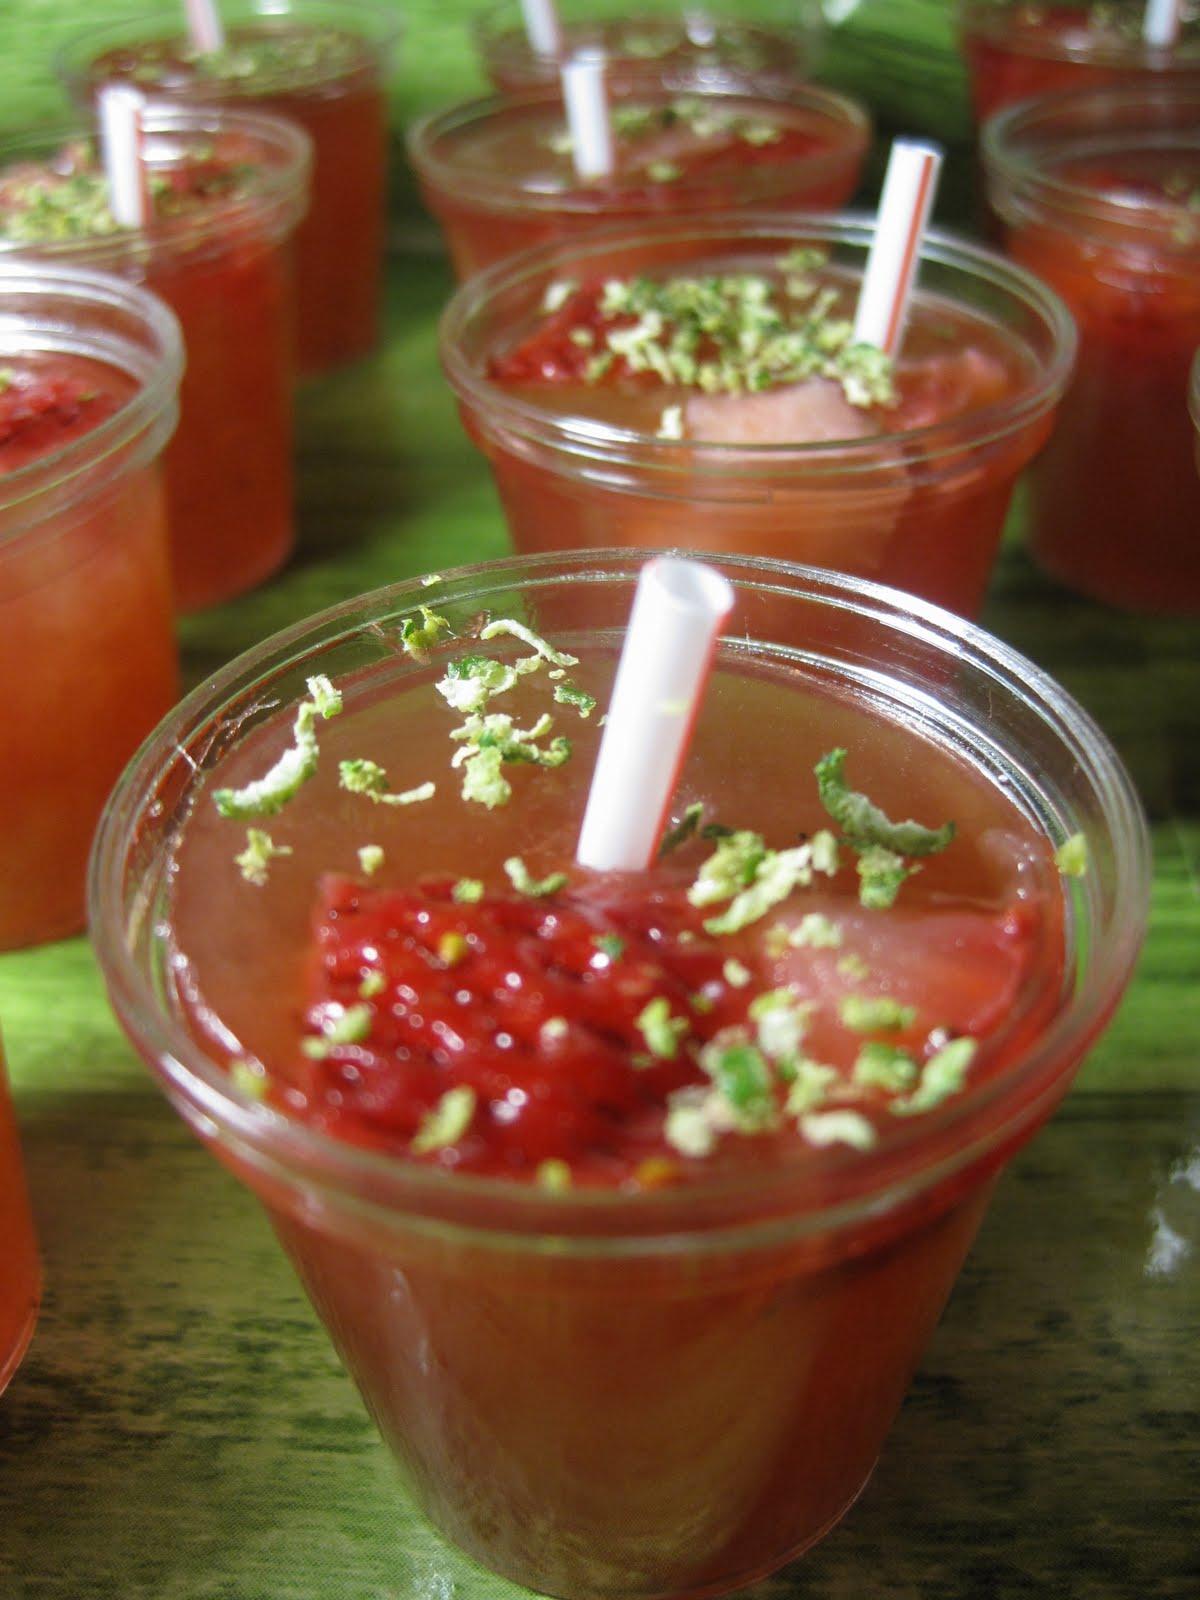 My Jello Americans: The Strawberry Rhubarb Margarita